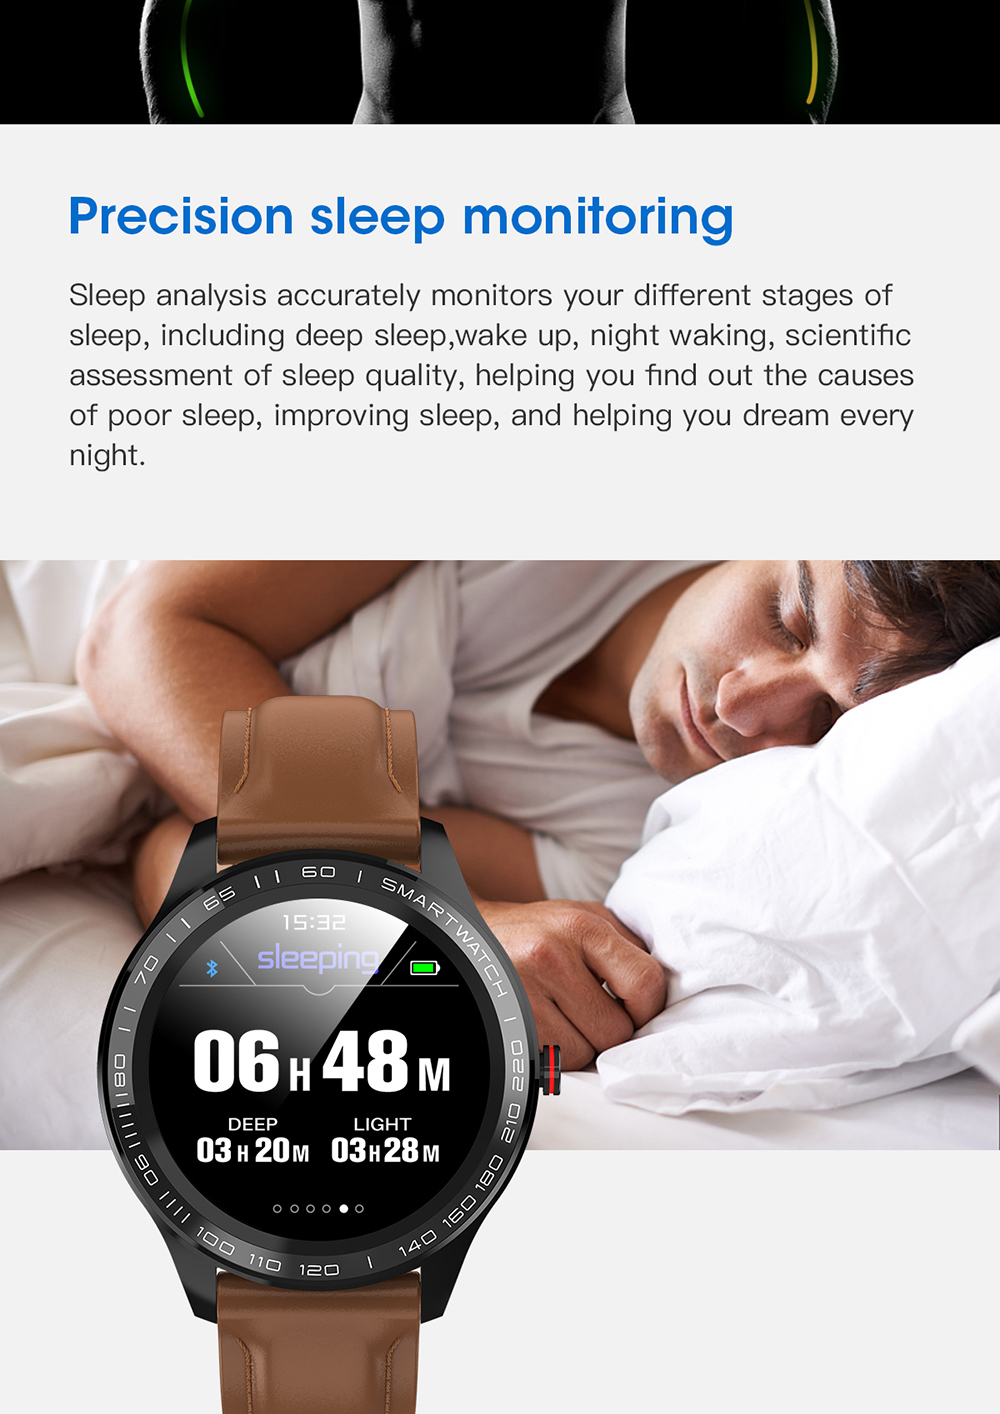 H536b4f26885848a39568a5900451ec88R 696 L9 Full touch Smart Watch Men ECG+PPG Heart Rate Blood Pressure oxygen Monitor IP68 Waterproof Bluetooth Smart Bracelet